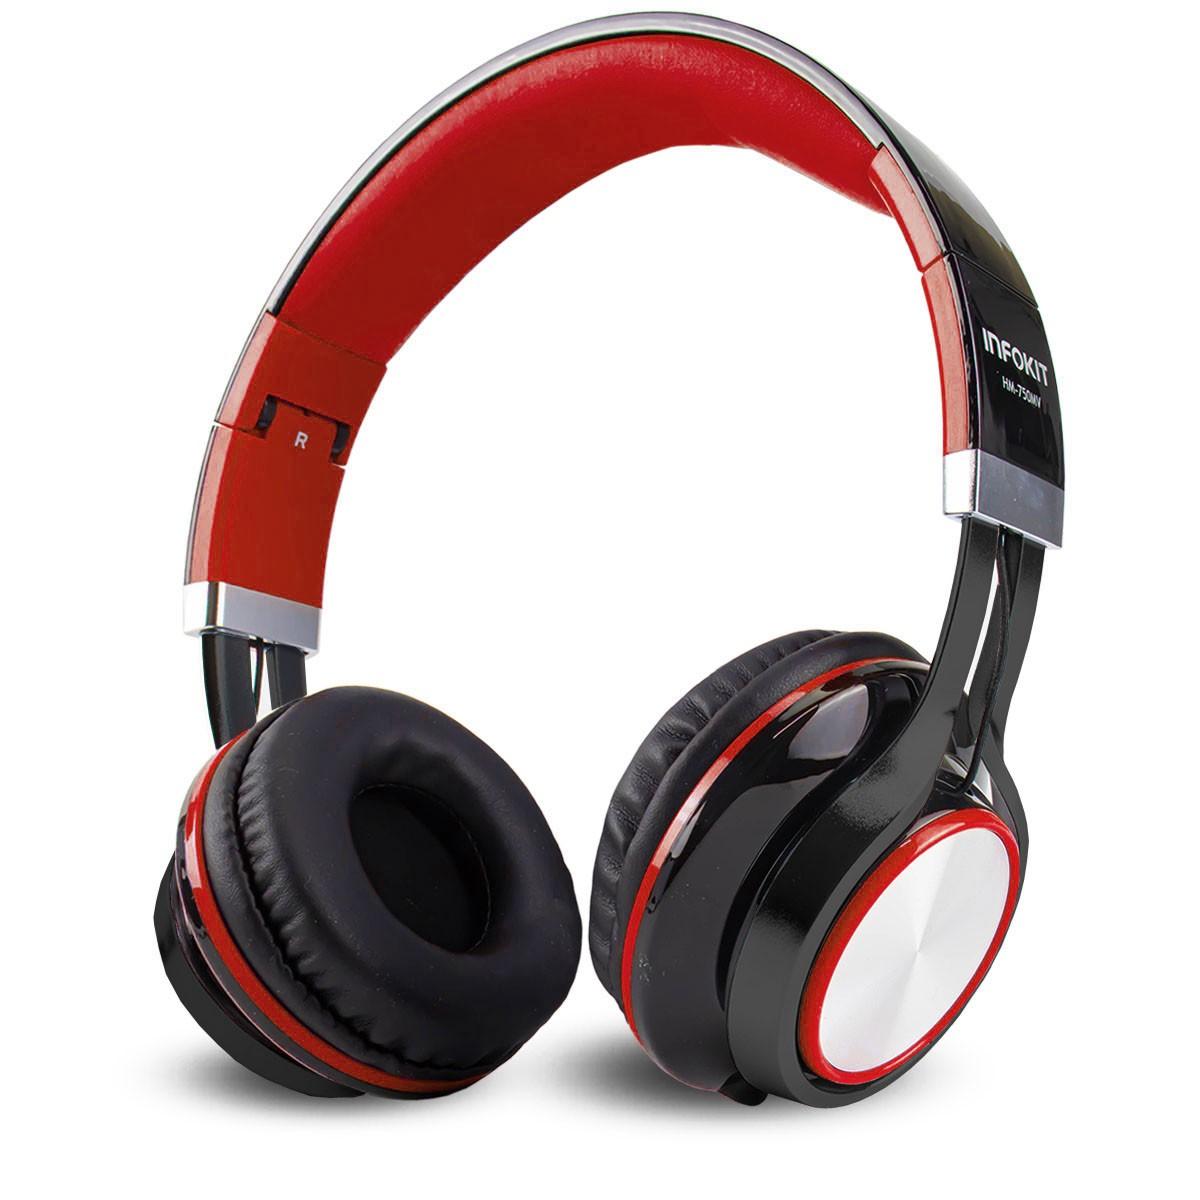 Fone Headphone Super Bass P3 com Microfone para Celular Infokit HM-750MV